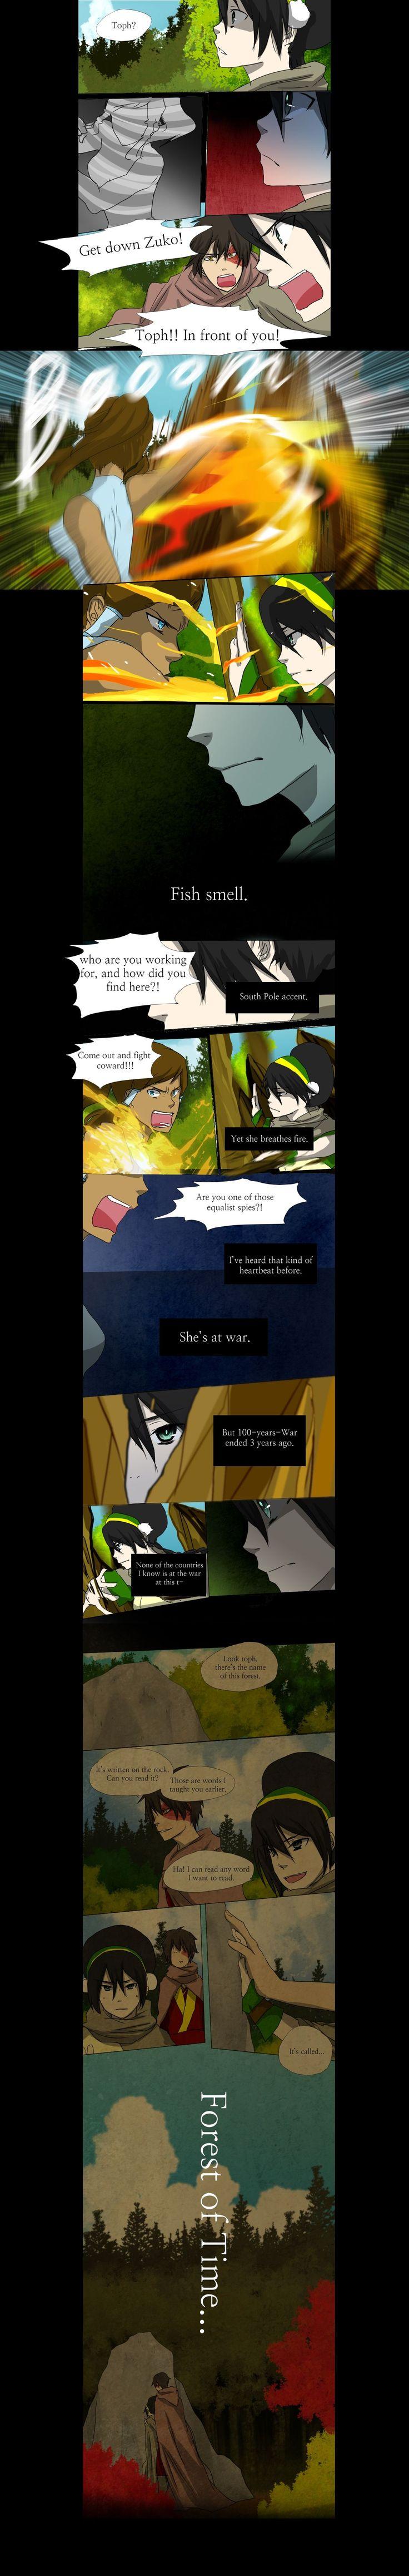 Avatar: The Last Airbender/#1323163 - Zerochan